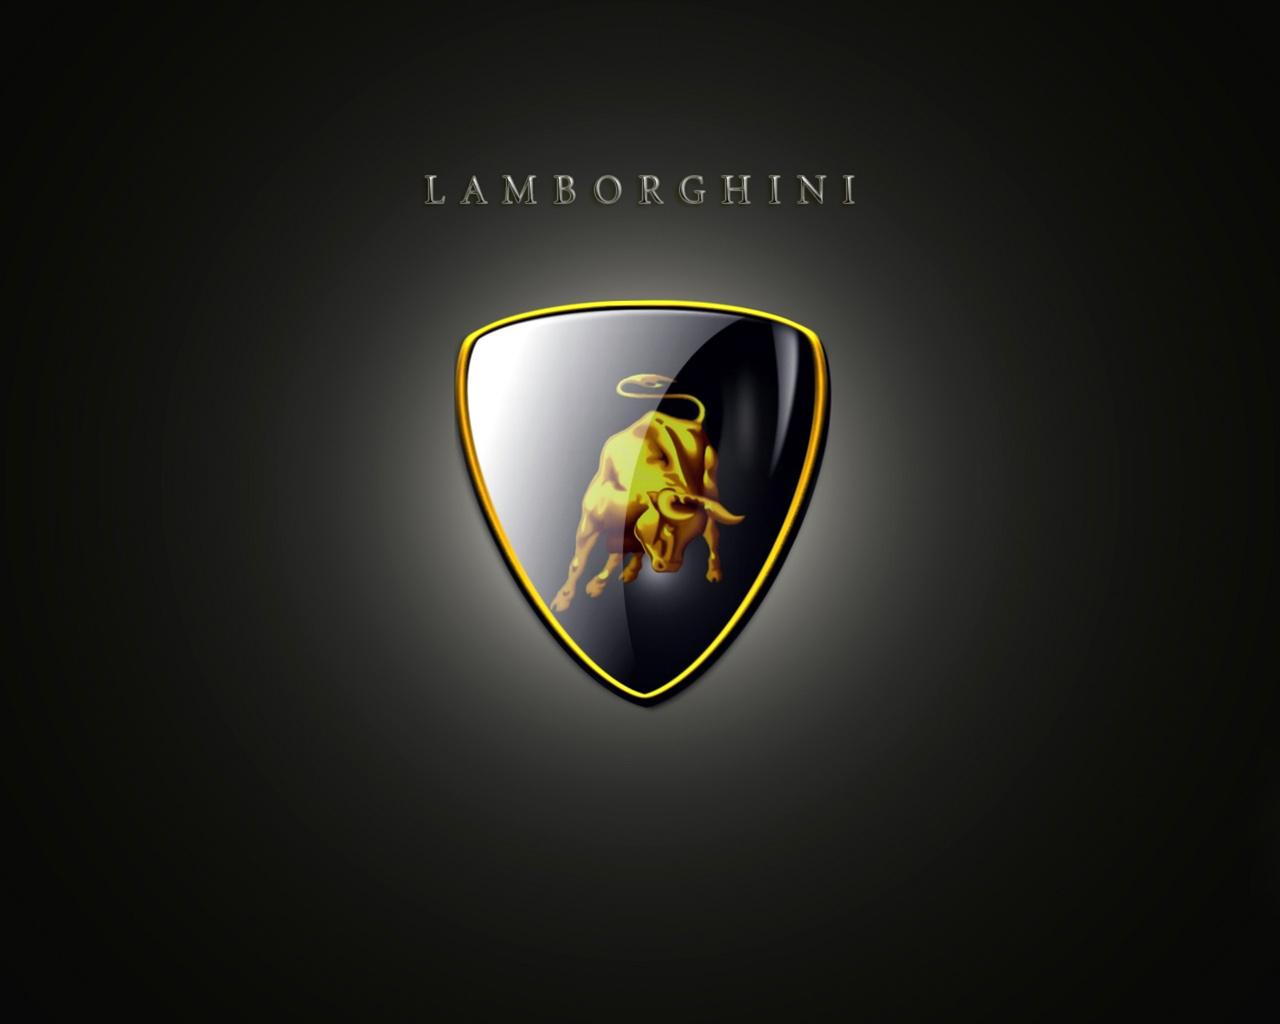 Lamborghini Emblem HD Widescreen Wallpaper